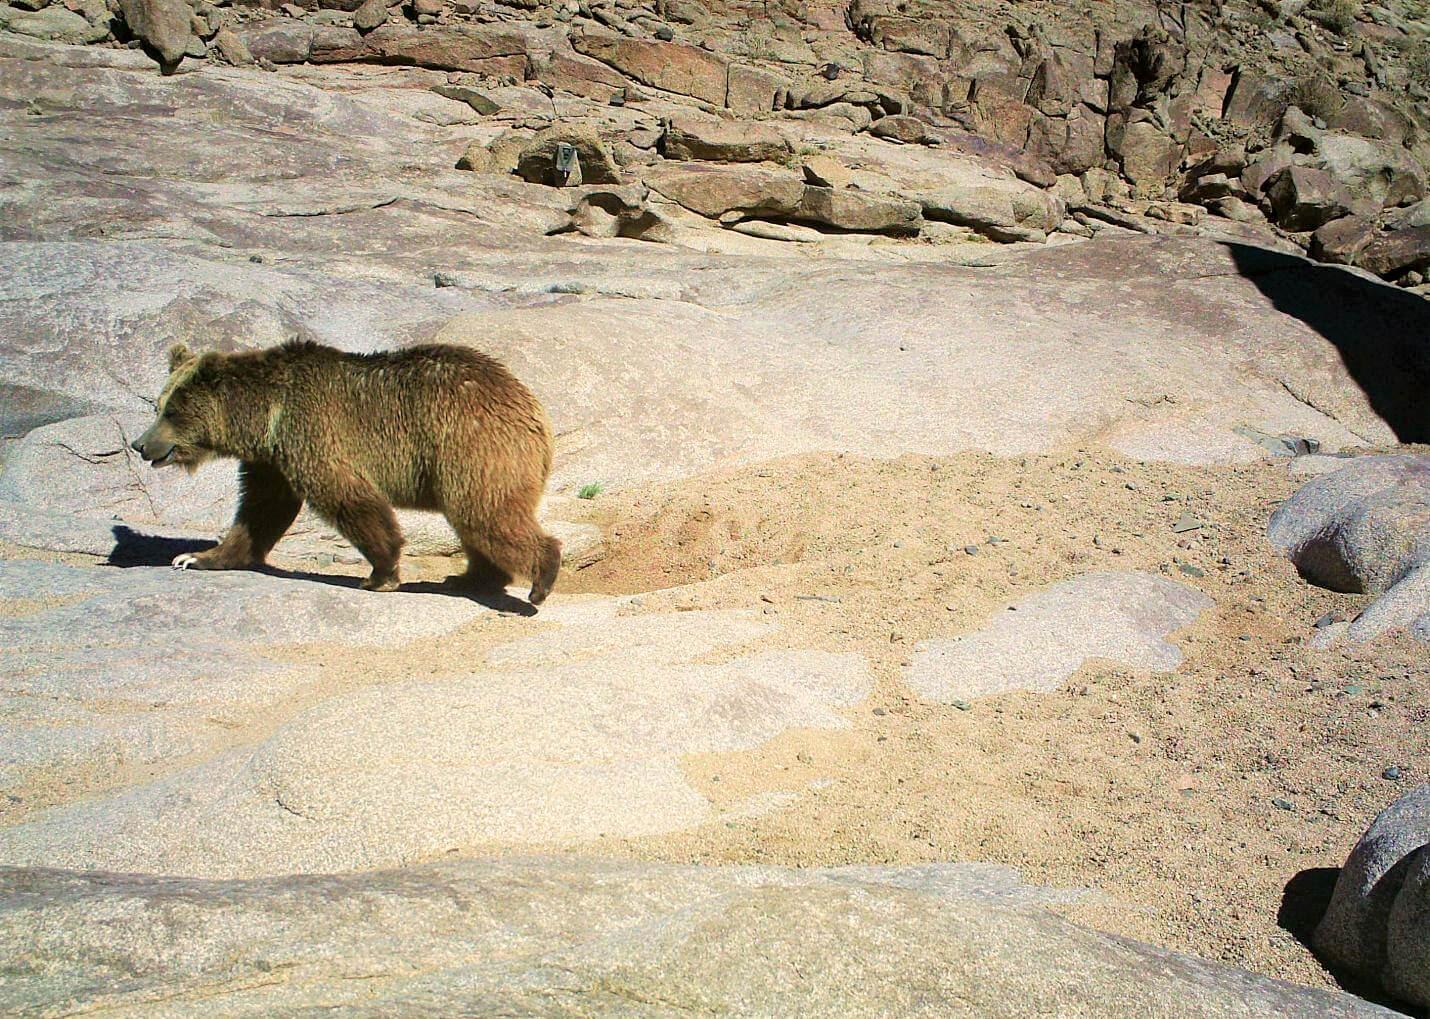 Mongolia steppe Wildlife Initiative